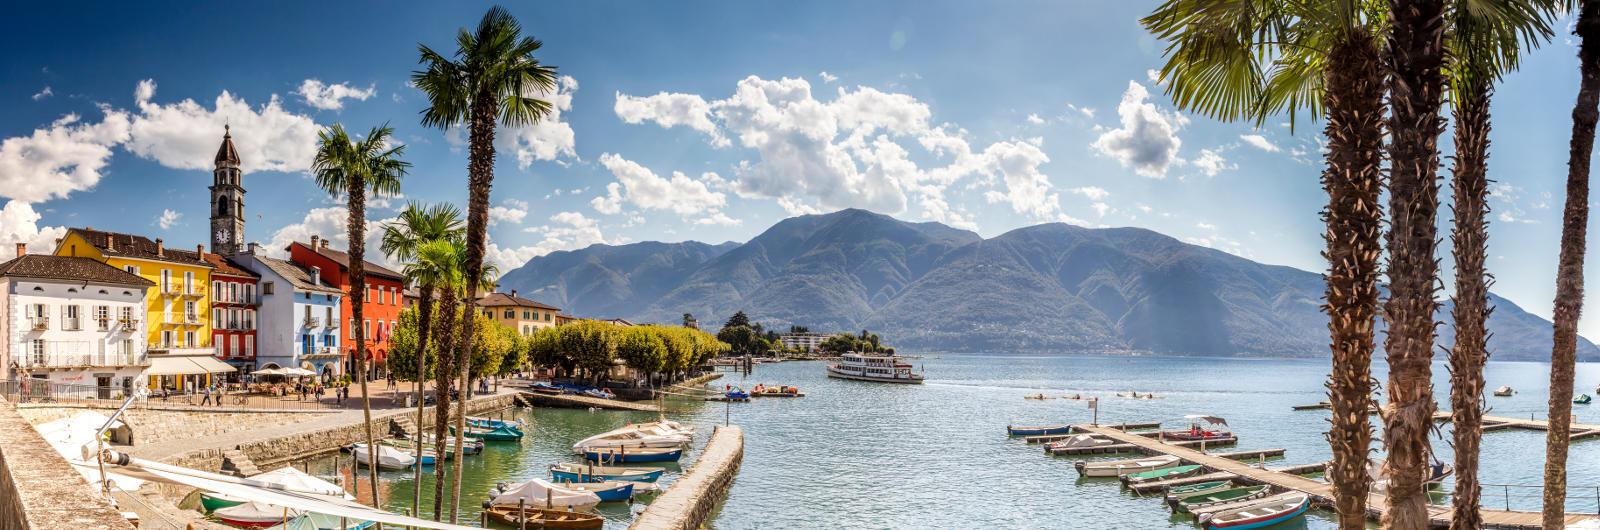 Ascona - Lungolago - Panorama